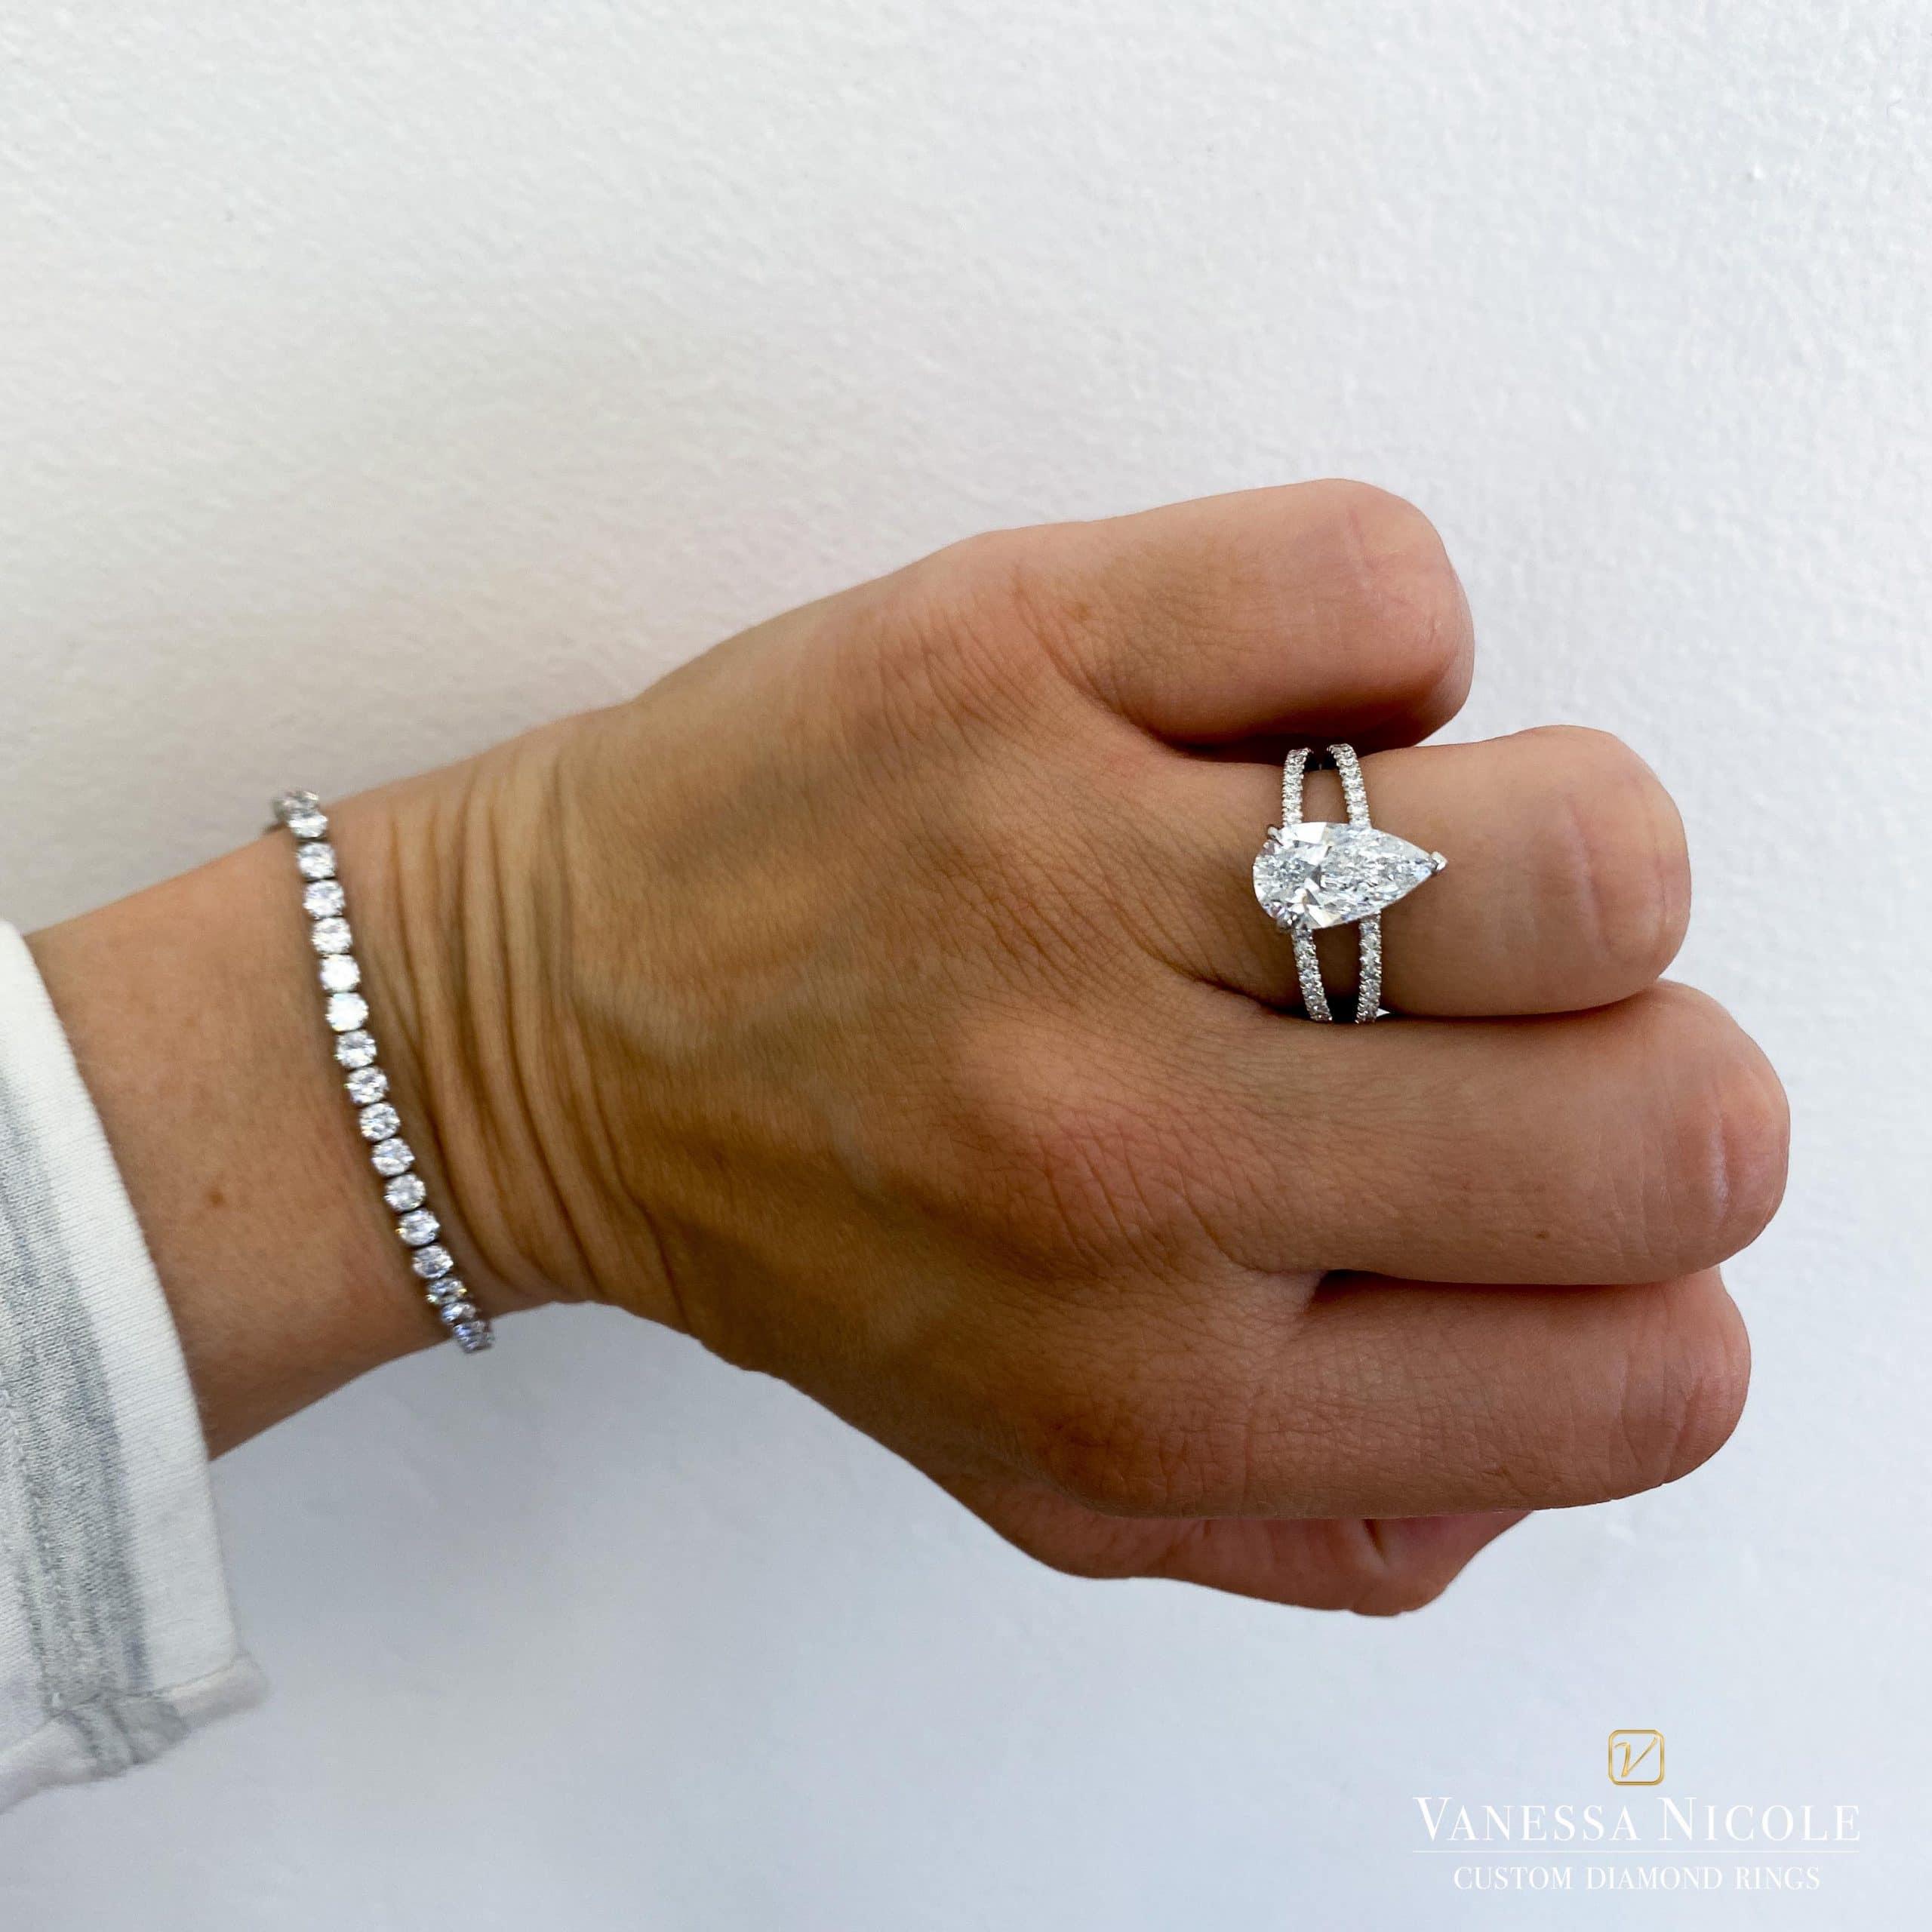 pear shaped diamond in platinum setting